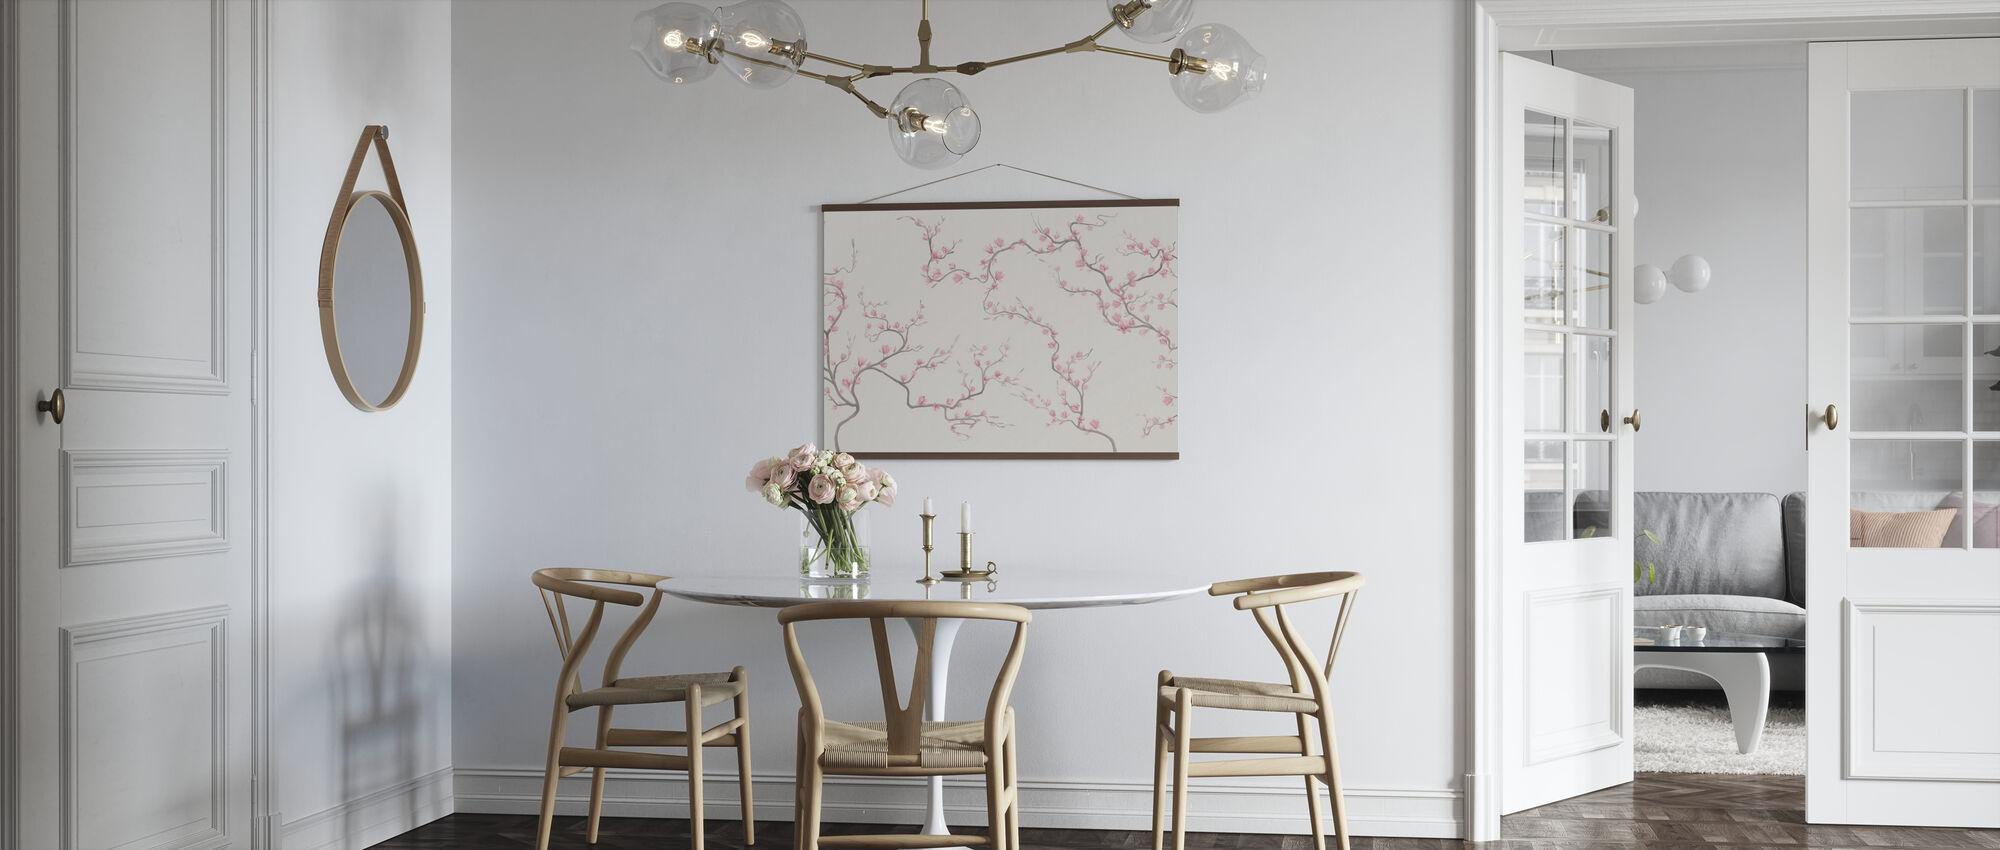 Flourishing Magnolia - Natur - Poster - Kitchen